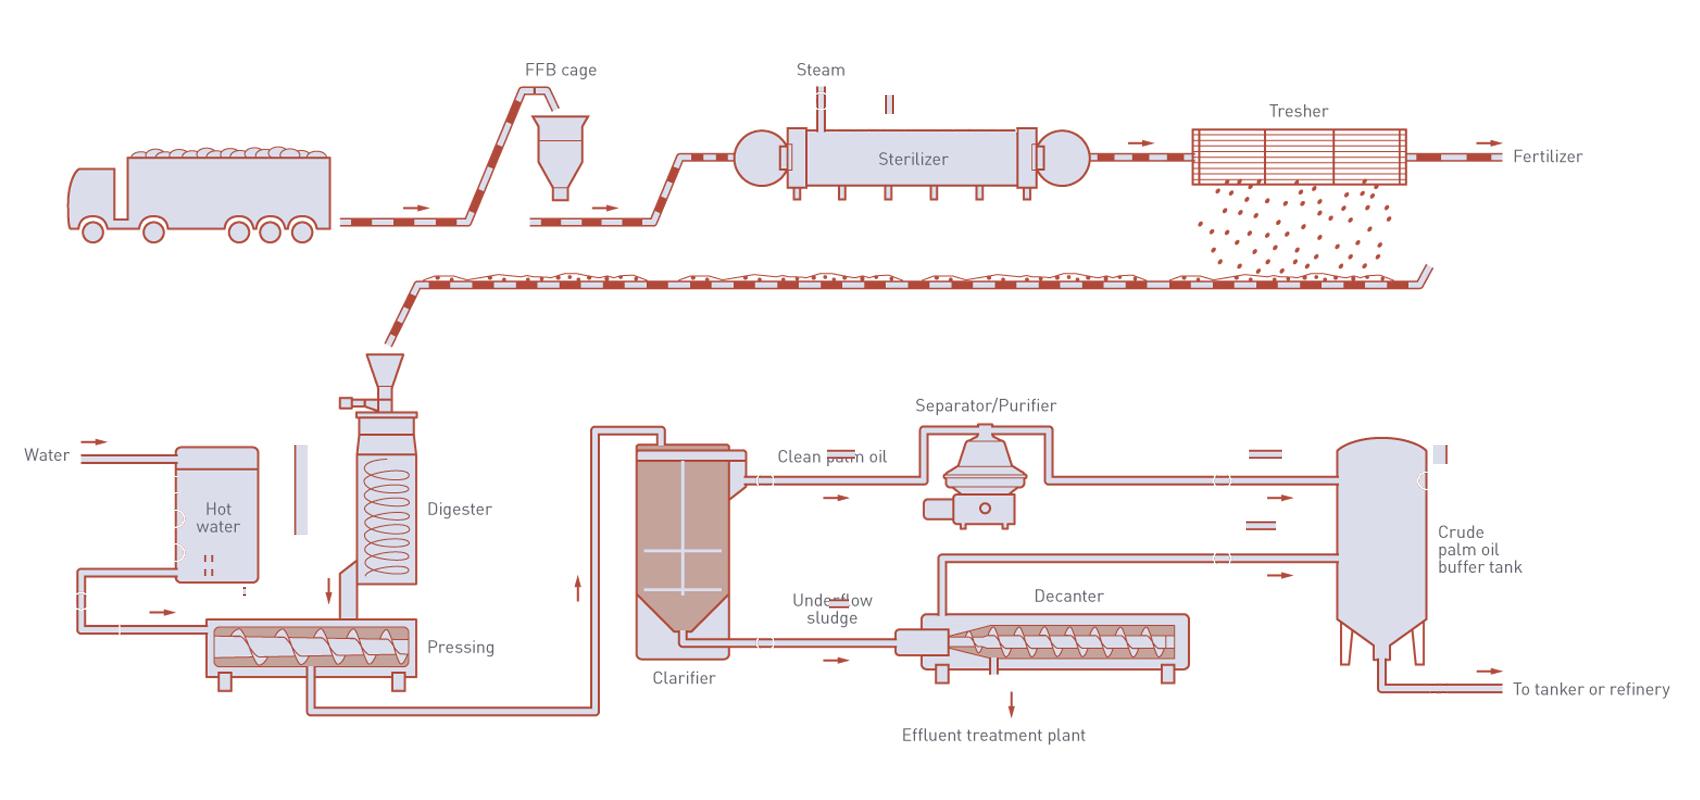 crude-palm-oil-process-flowchart-decanter-centrifuge